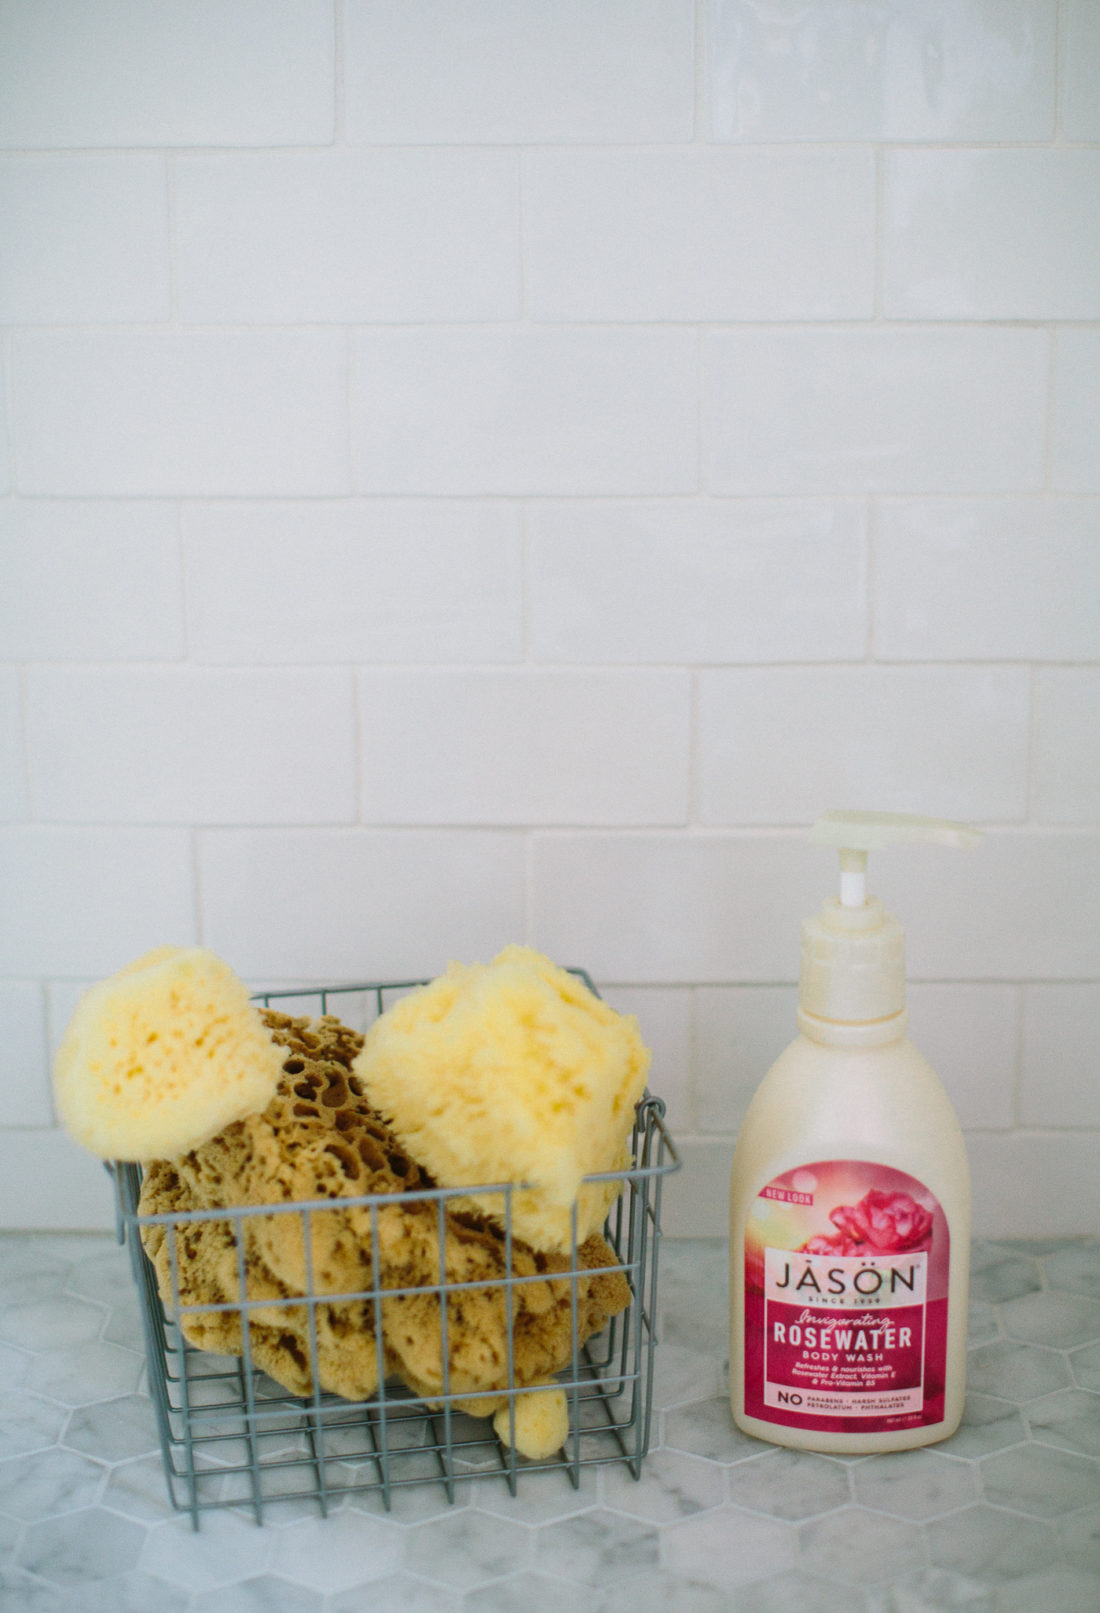 Eva Amurri Martino shares how she uses JASON body wash during the holiday hostess season in her home